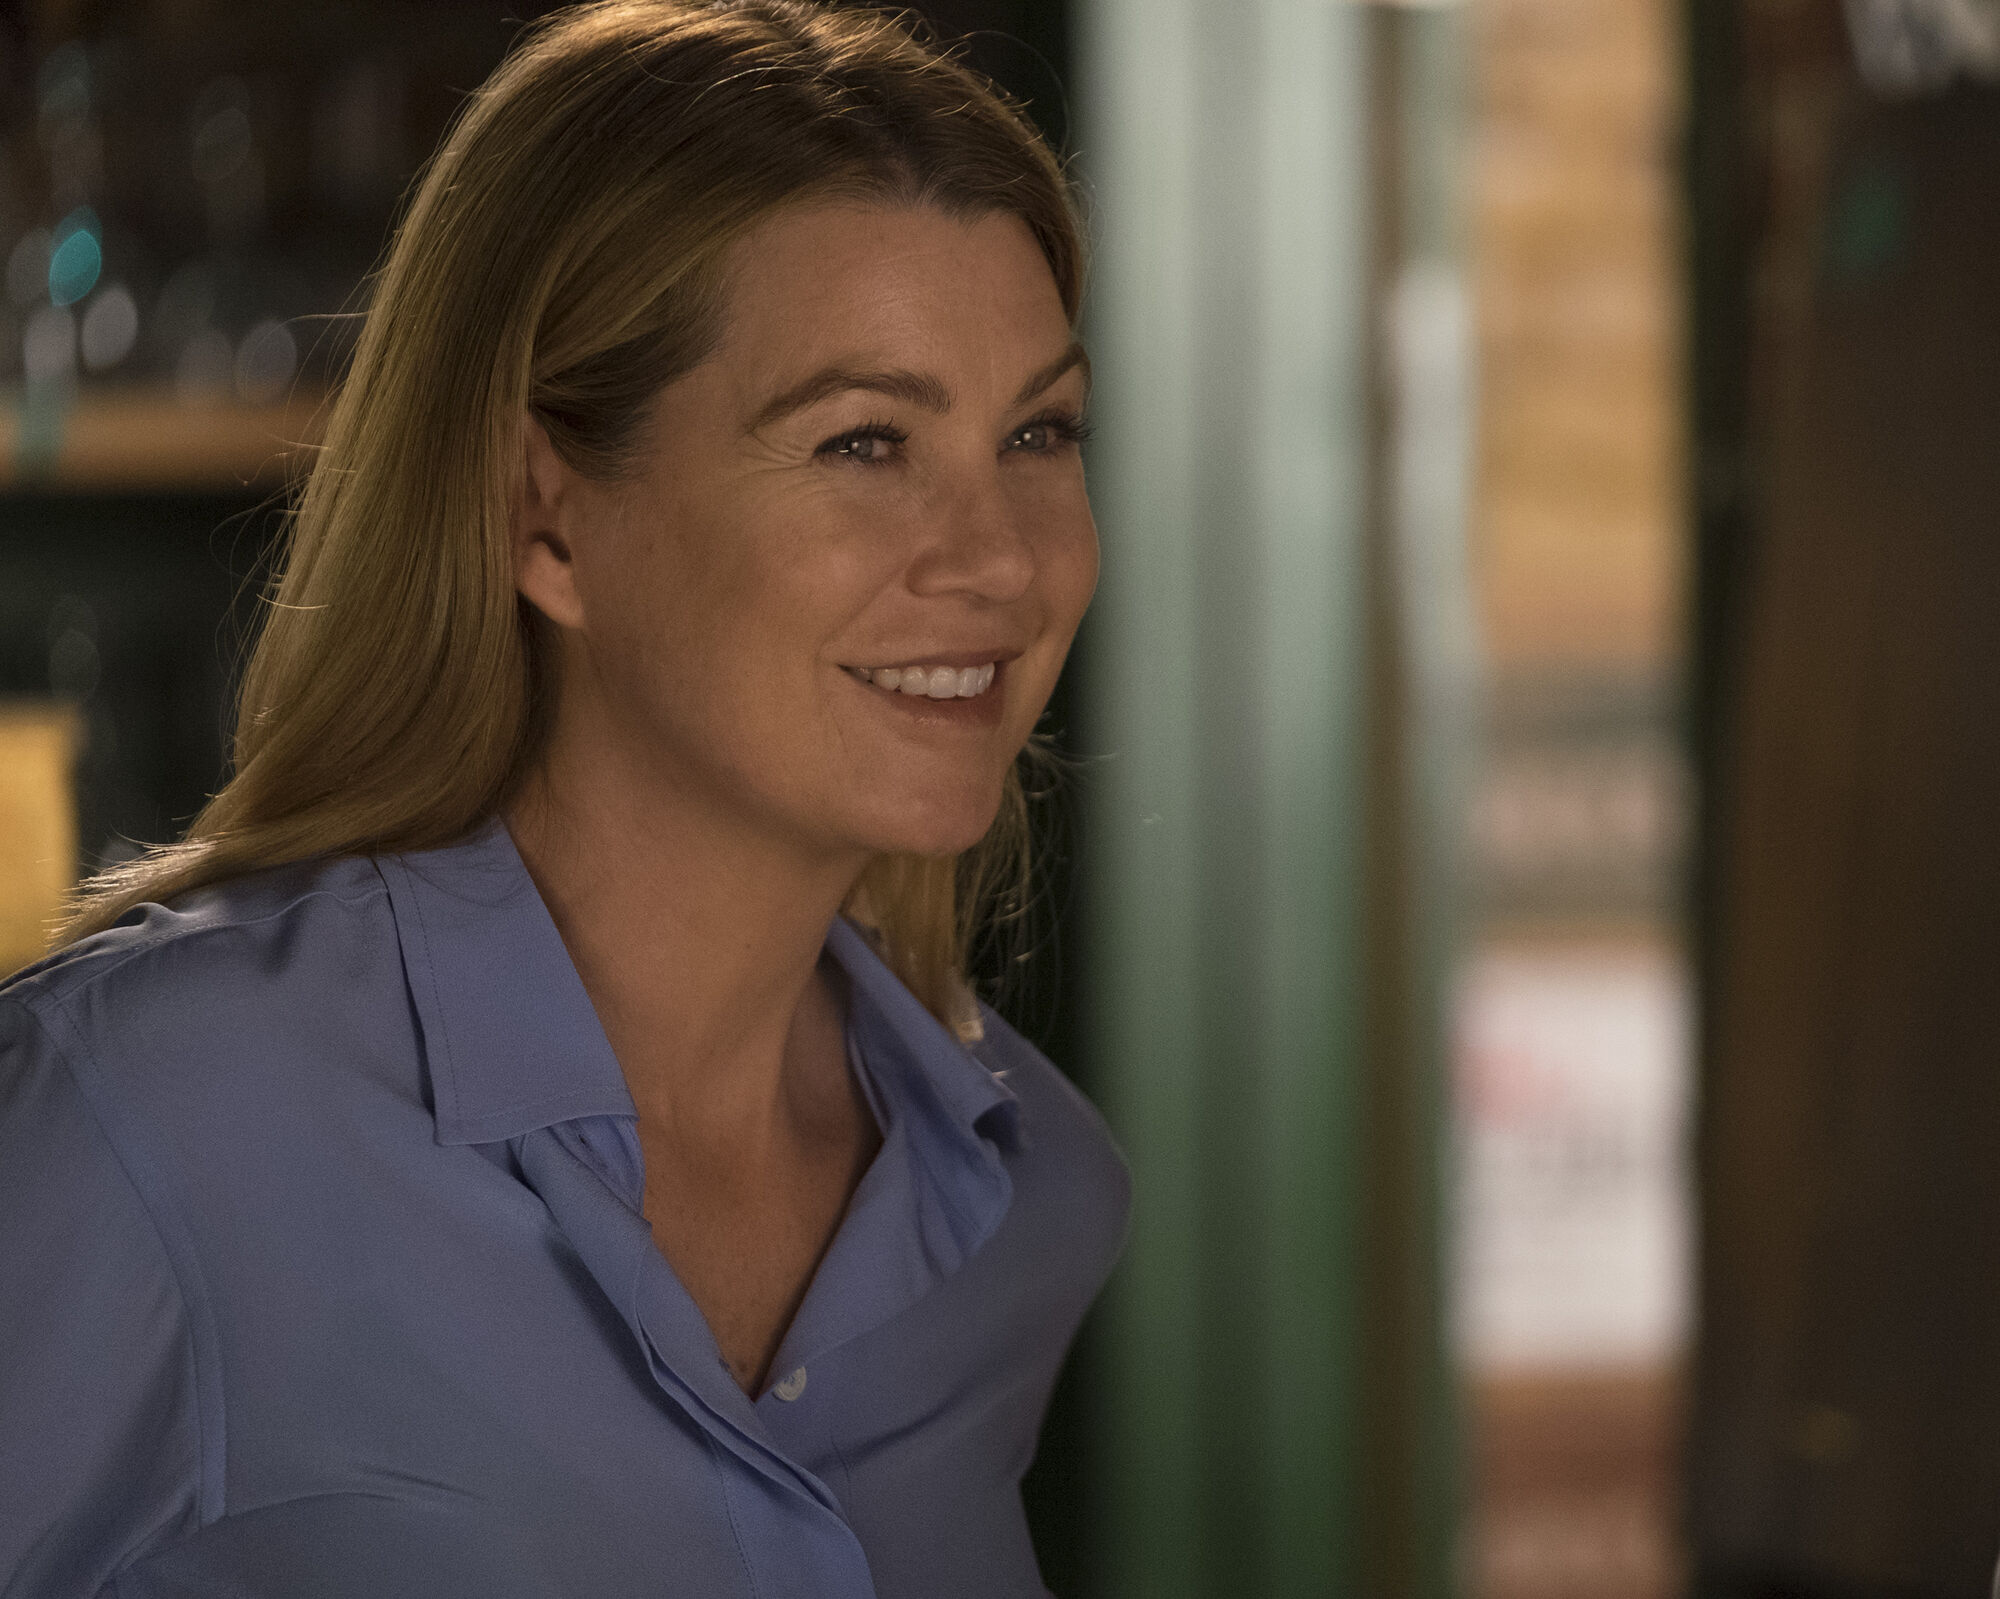 Grey Meredith